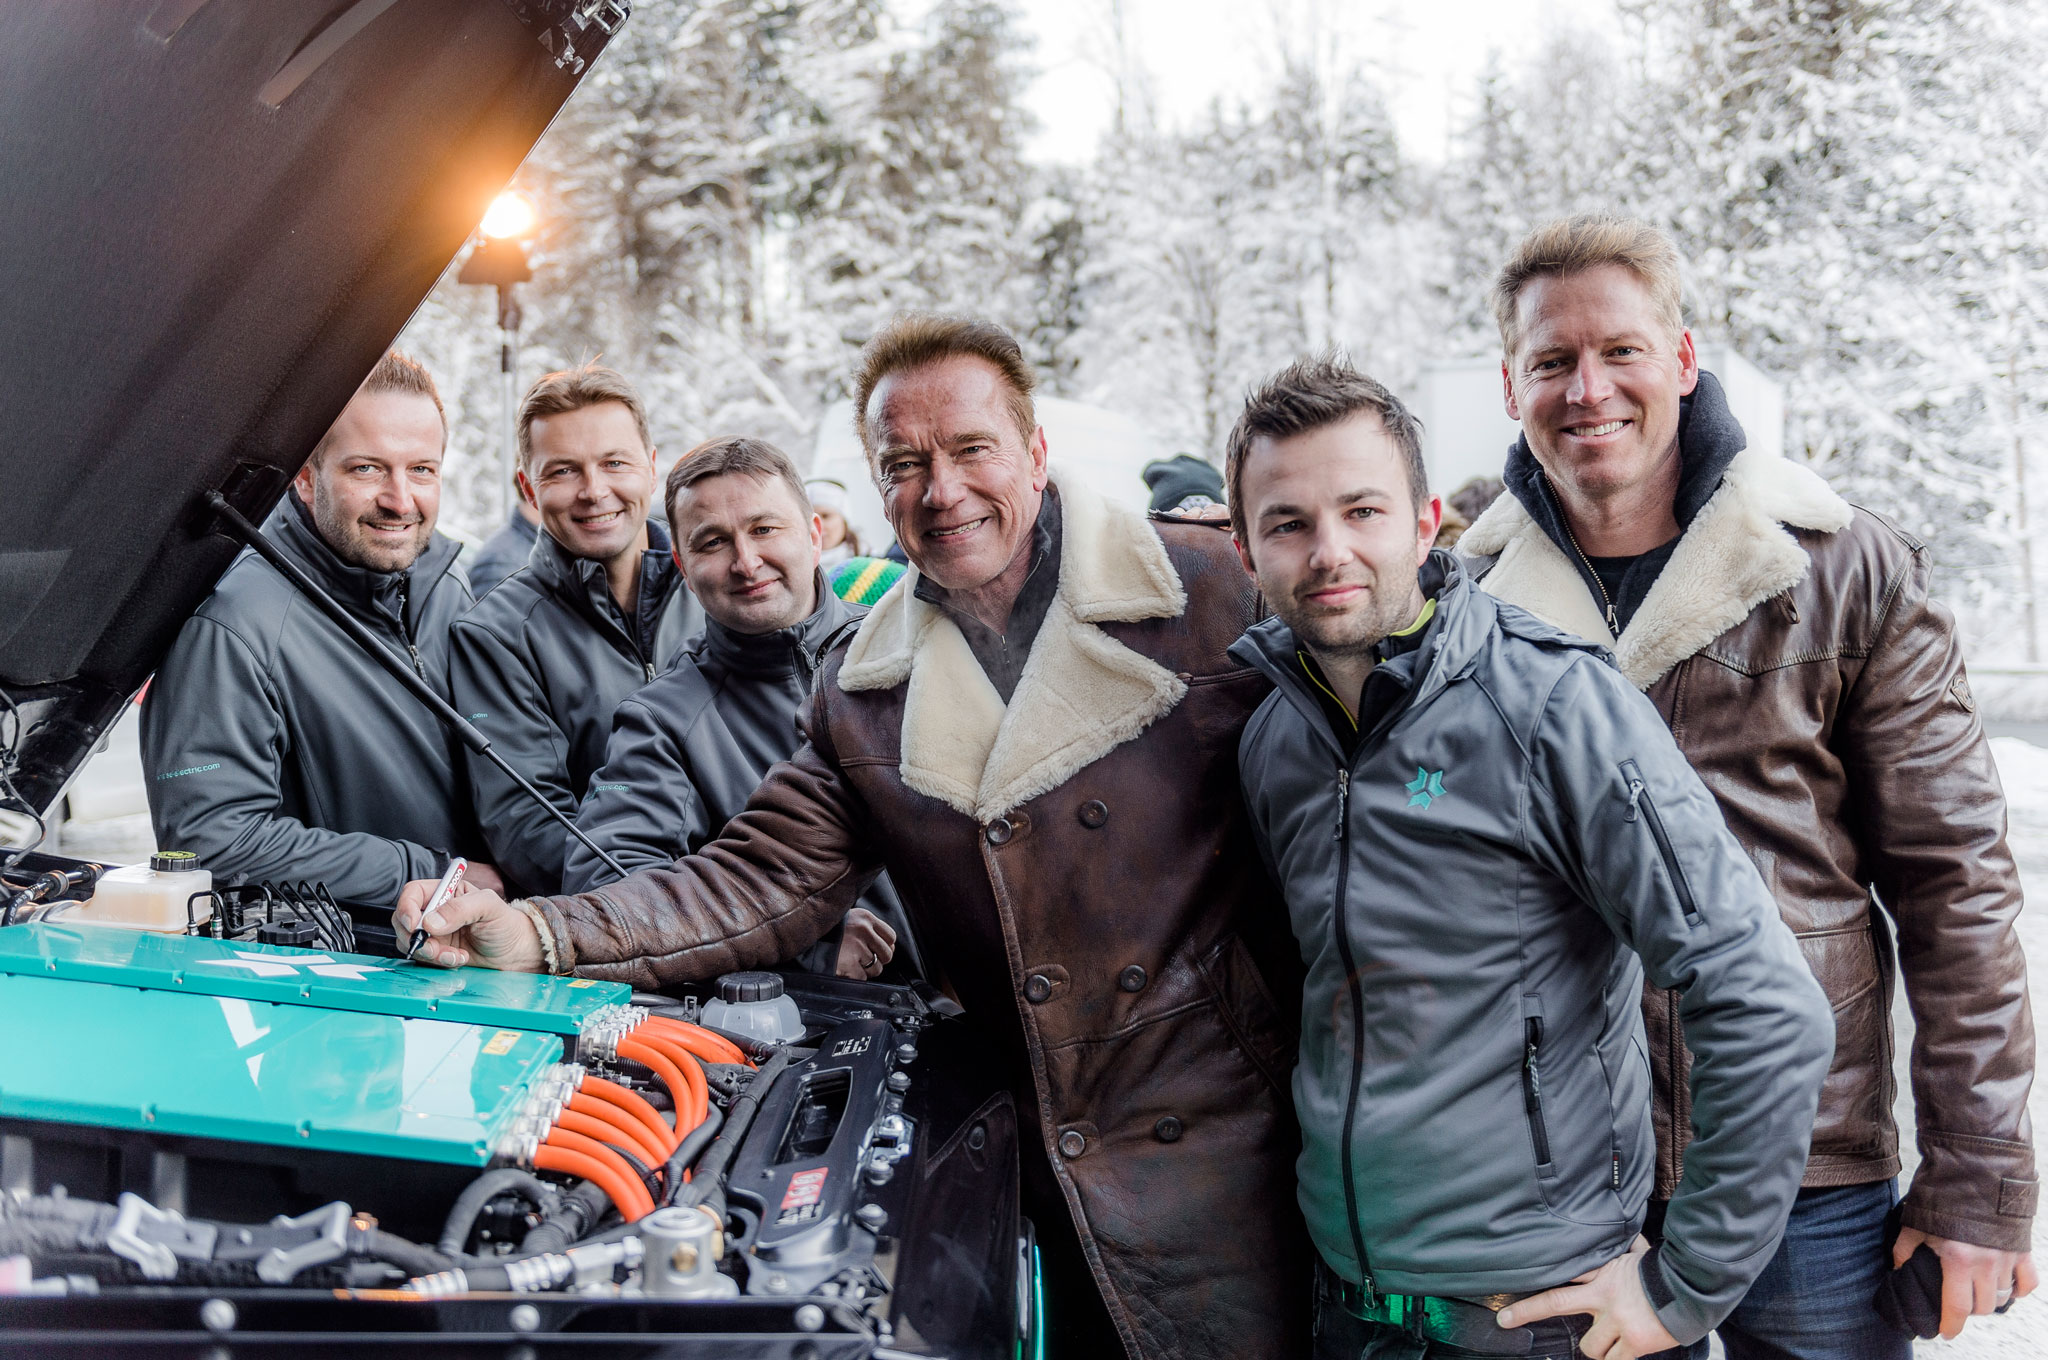 arnold schwarzenegger kreisel electric g wagen signing motor